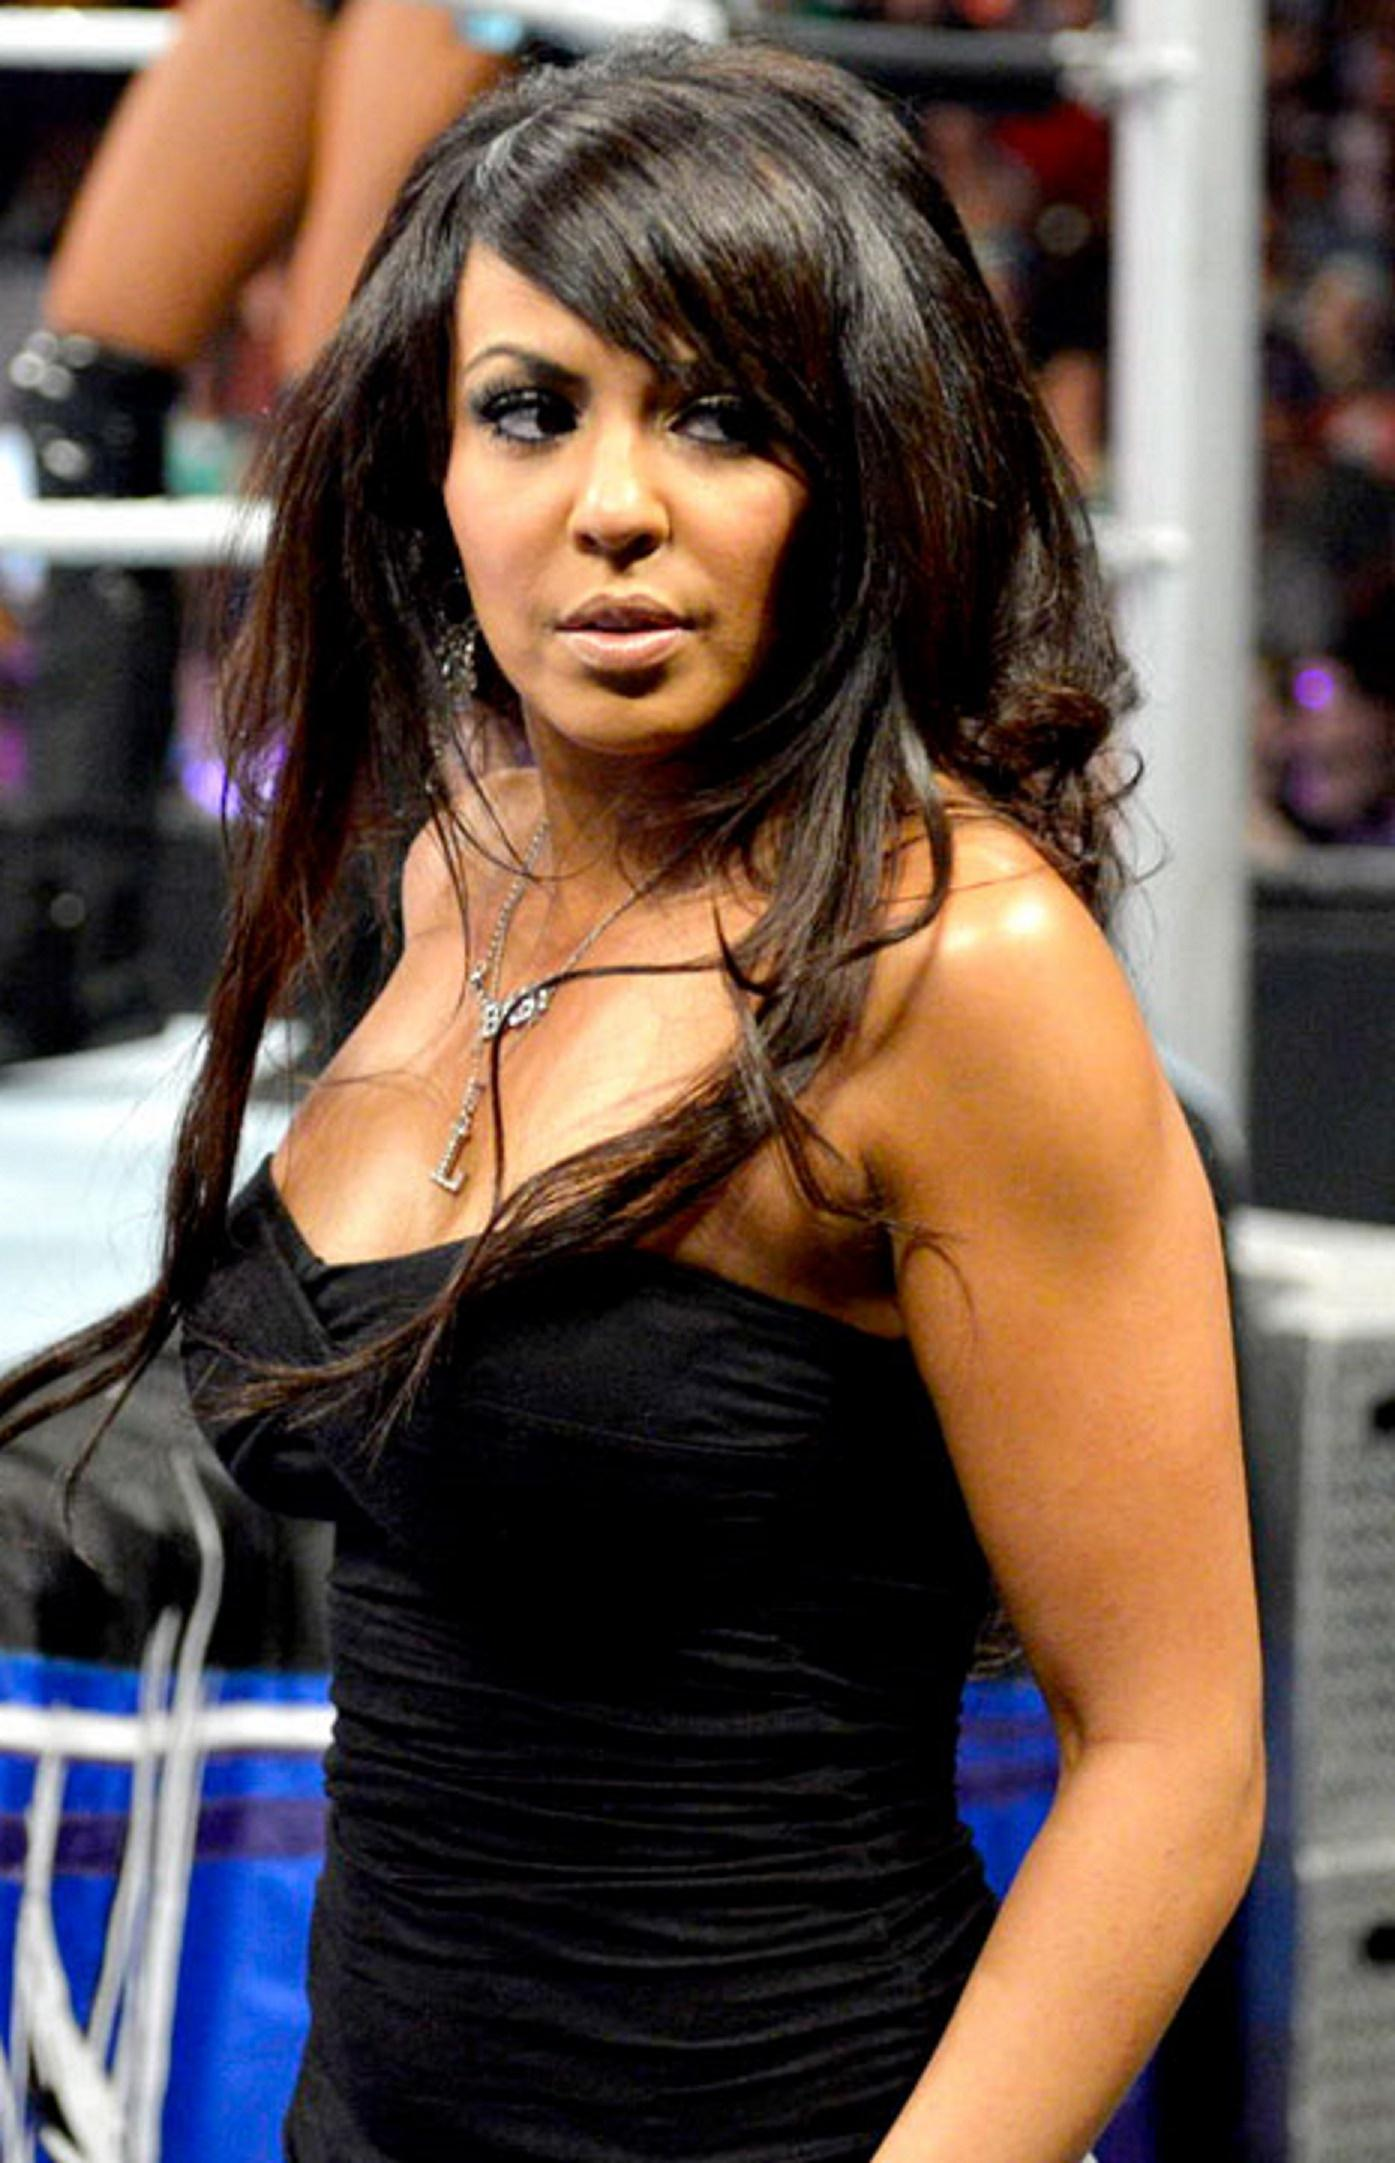 Layla side boobs pics